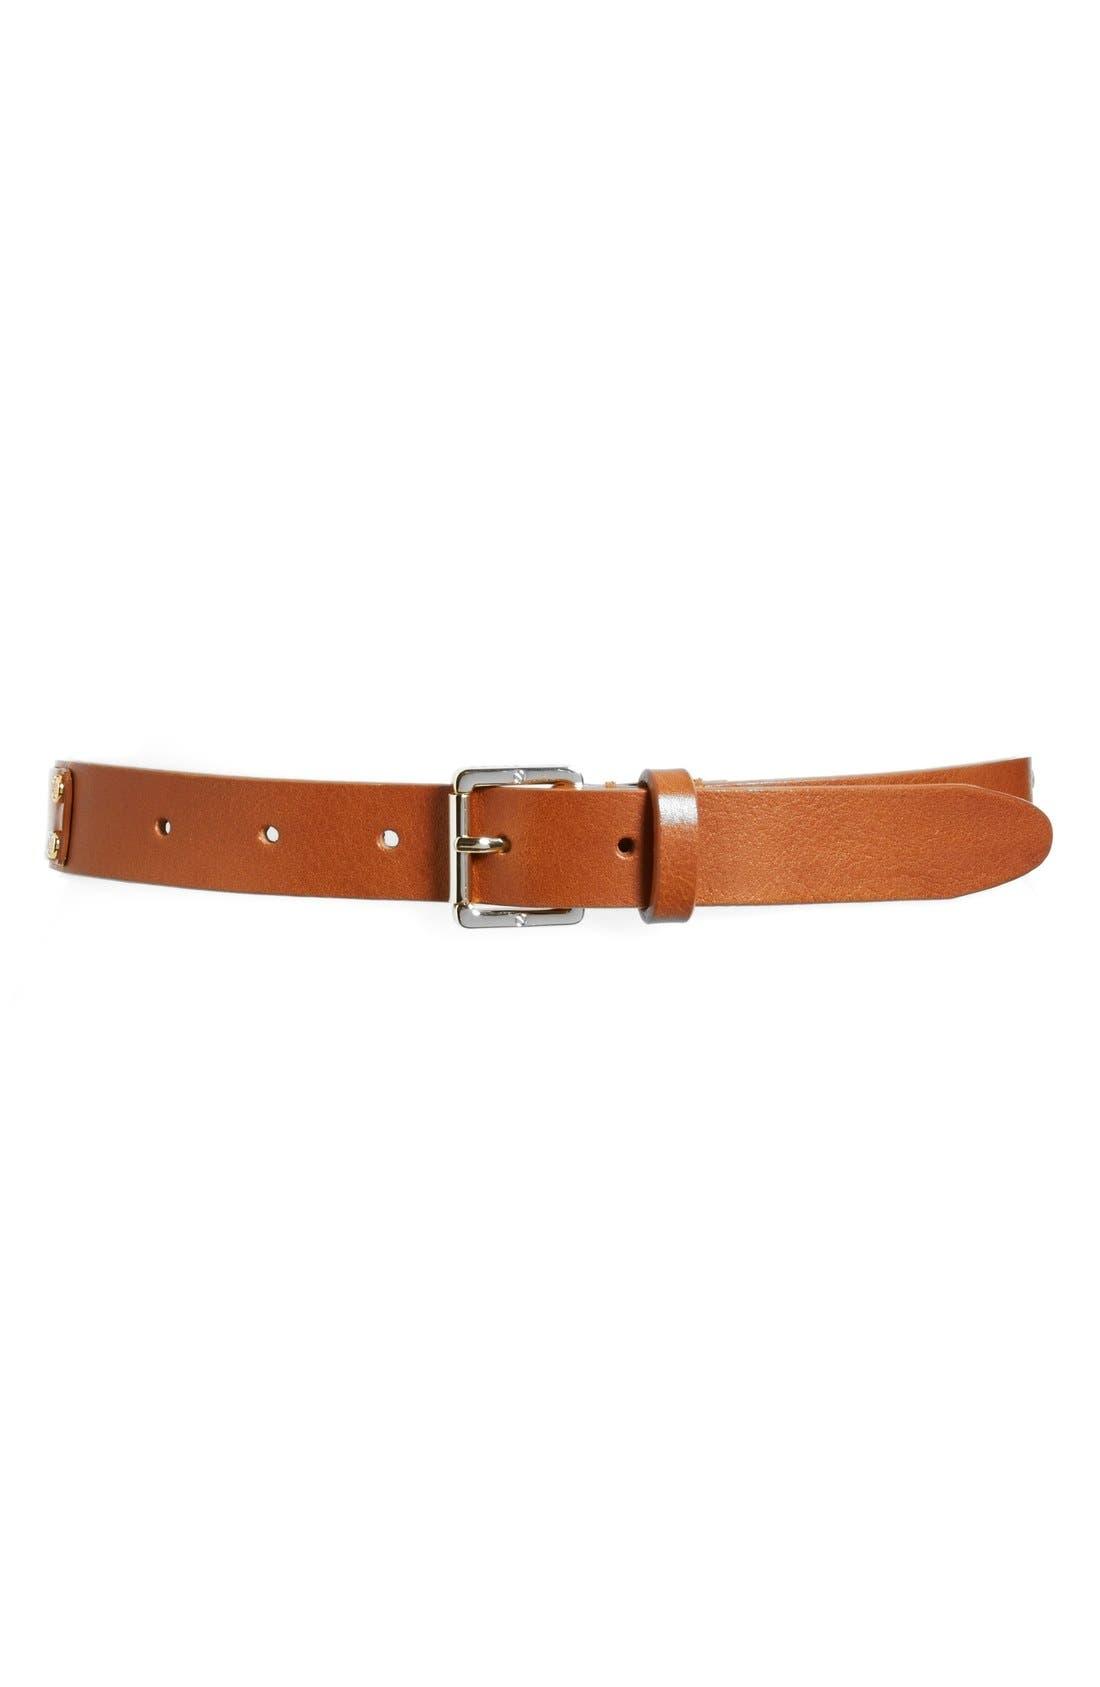 Alternate Image 1 Selected - Tory Burch Leather Rivet Belt